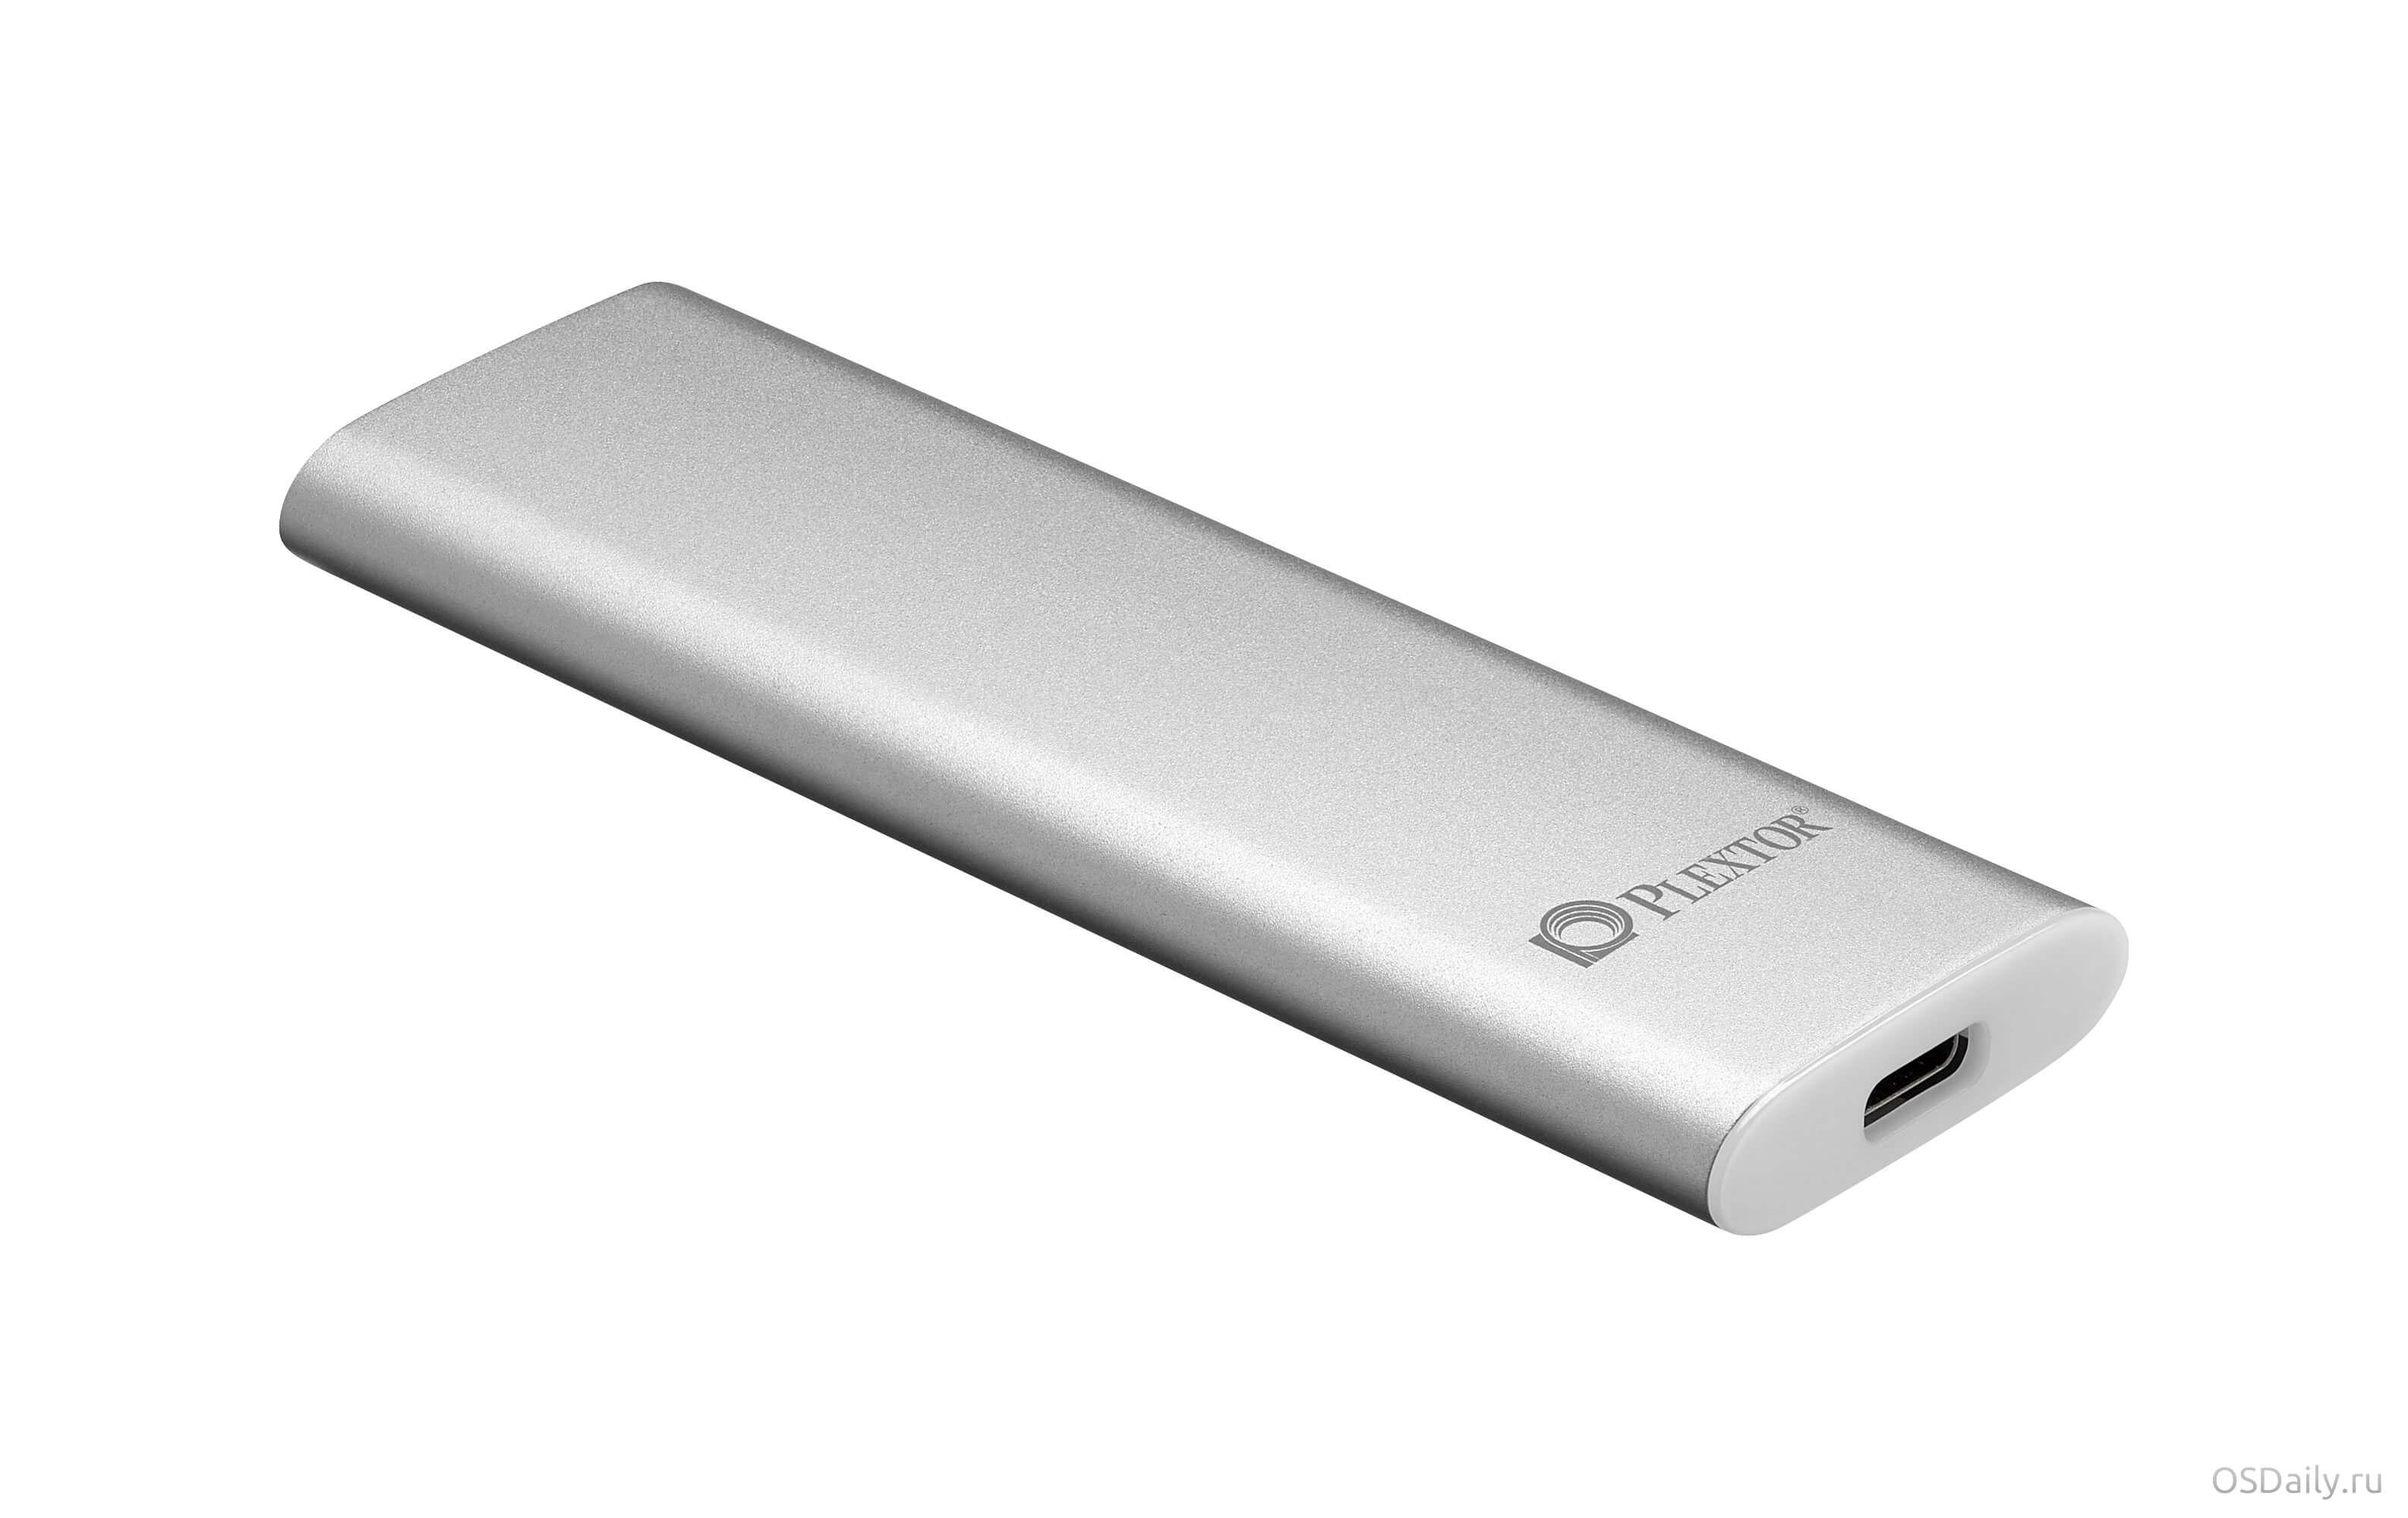 Пятилетняя гарантия на EX1 SSD